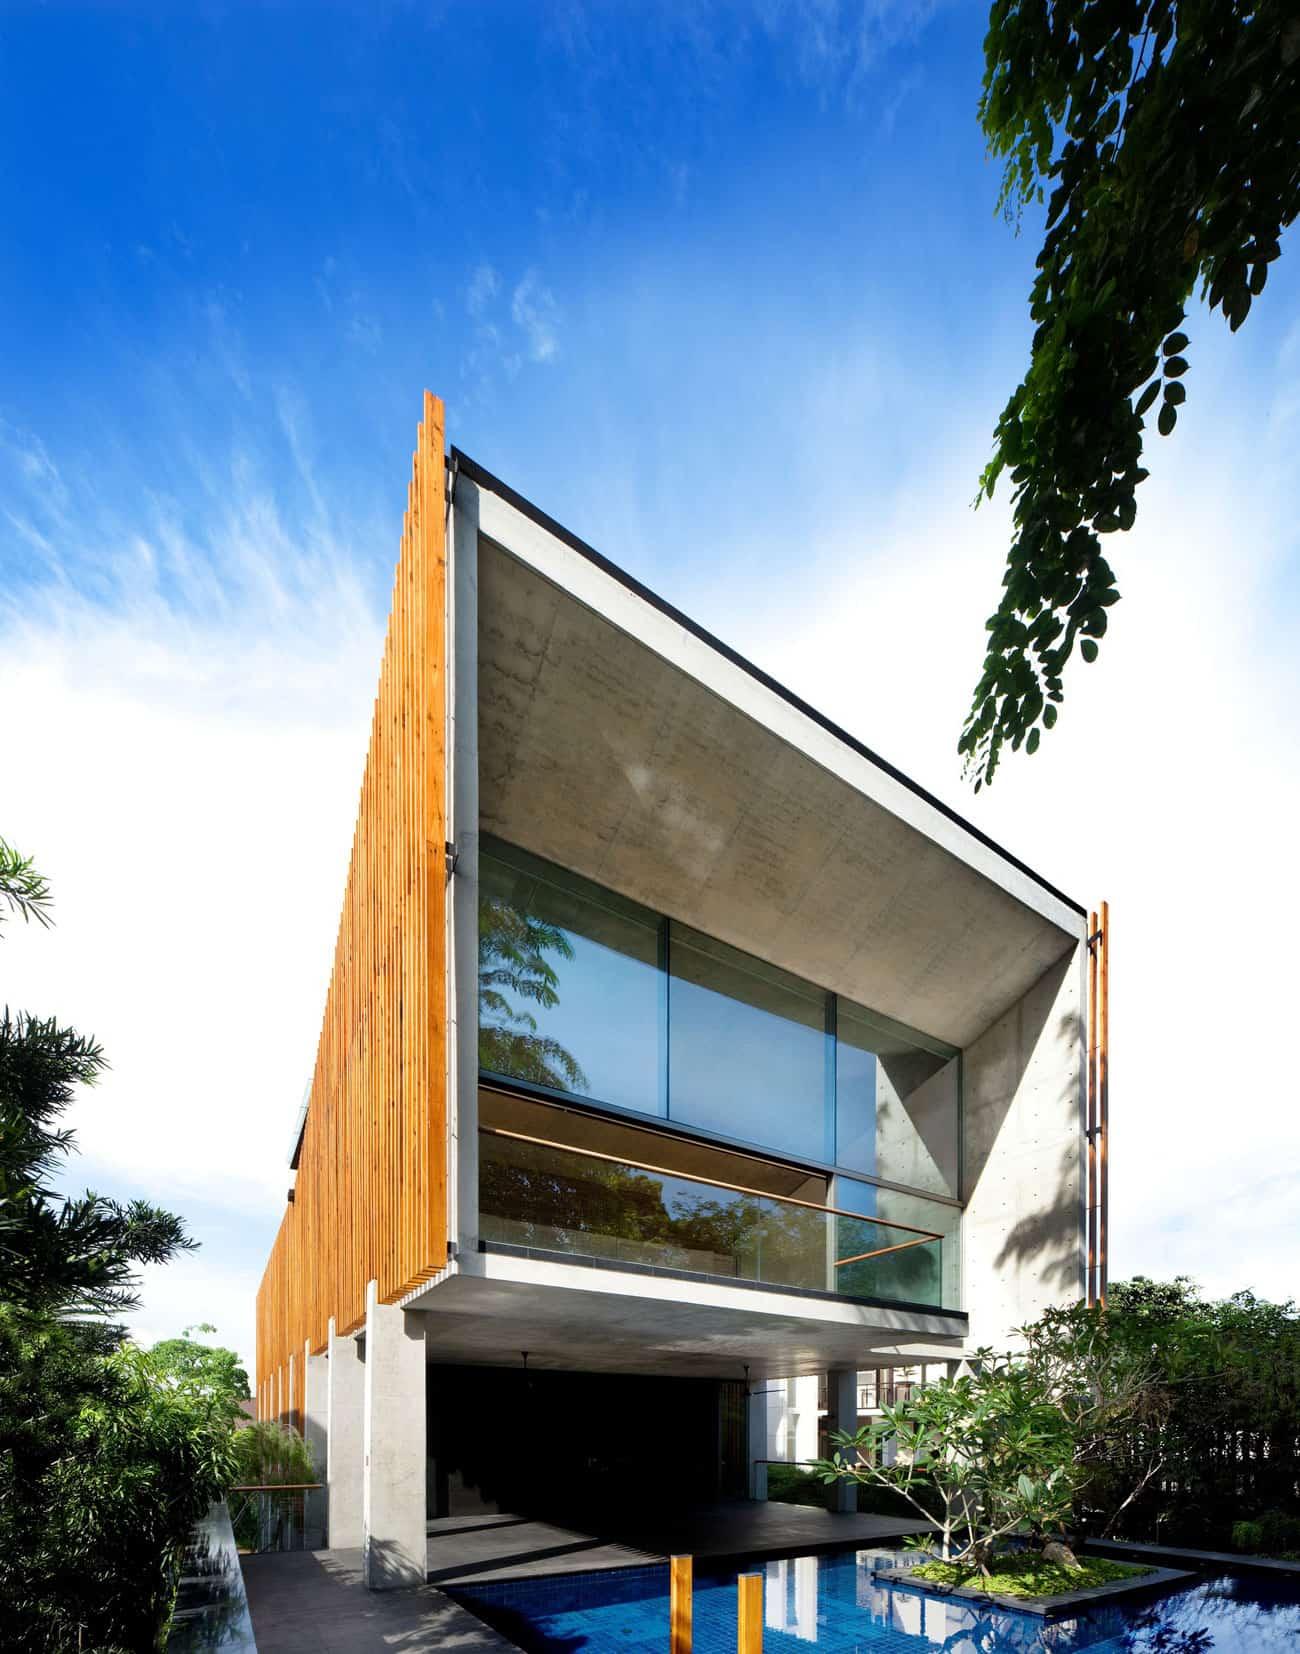 Sentosa House by Nicholas Burns (3)